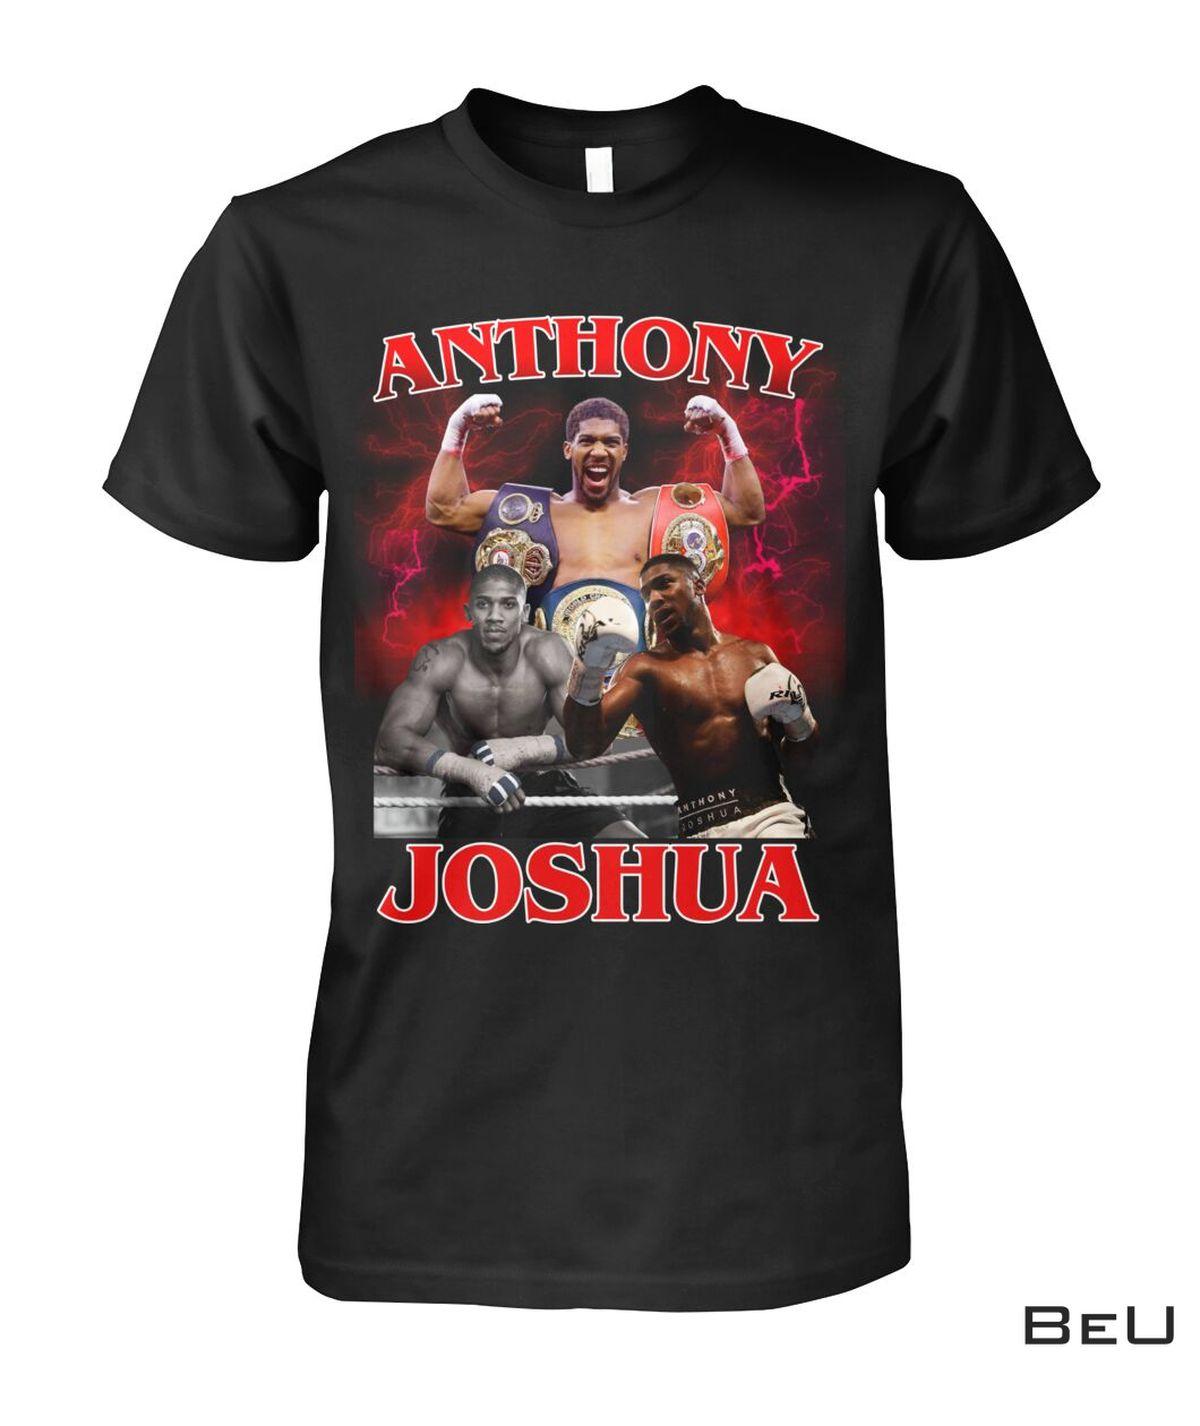 Anthony Joshua Champion Shirt